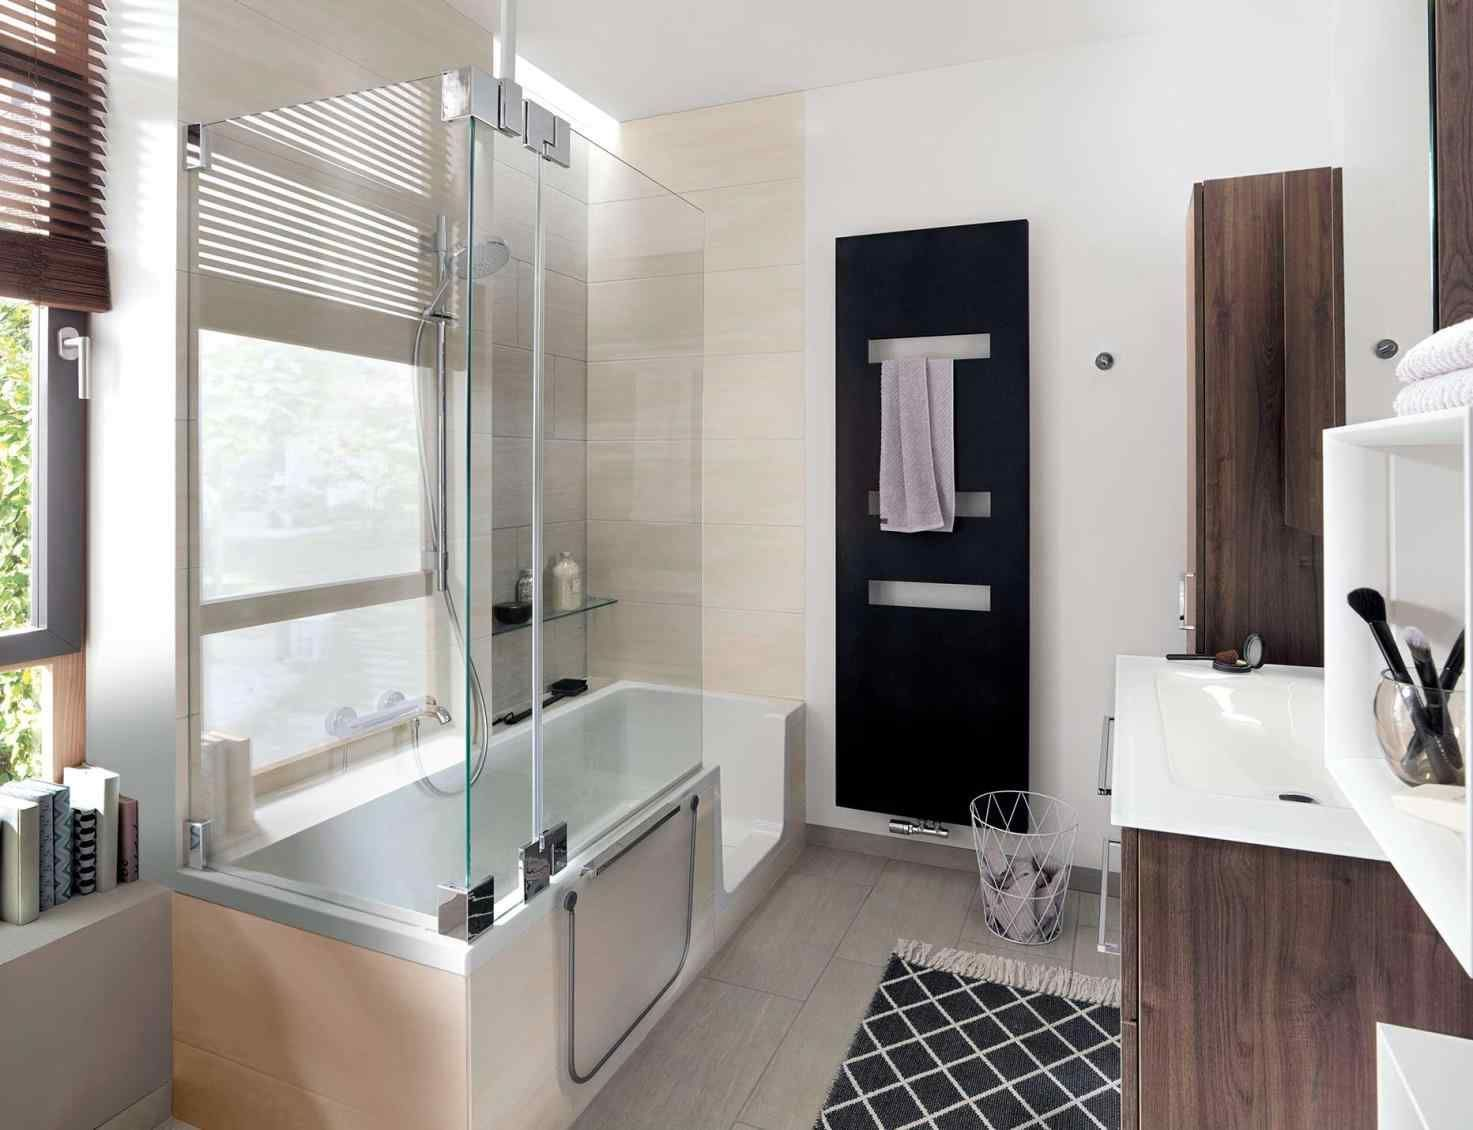 Bad Gestalten Modern Badezimmer Design fliesen ideen | Pinterest